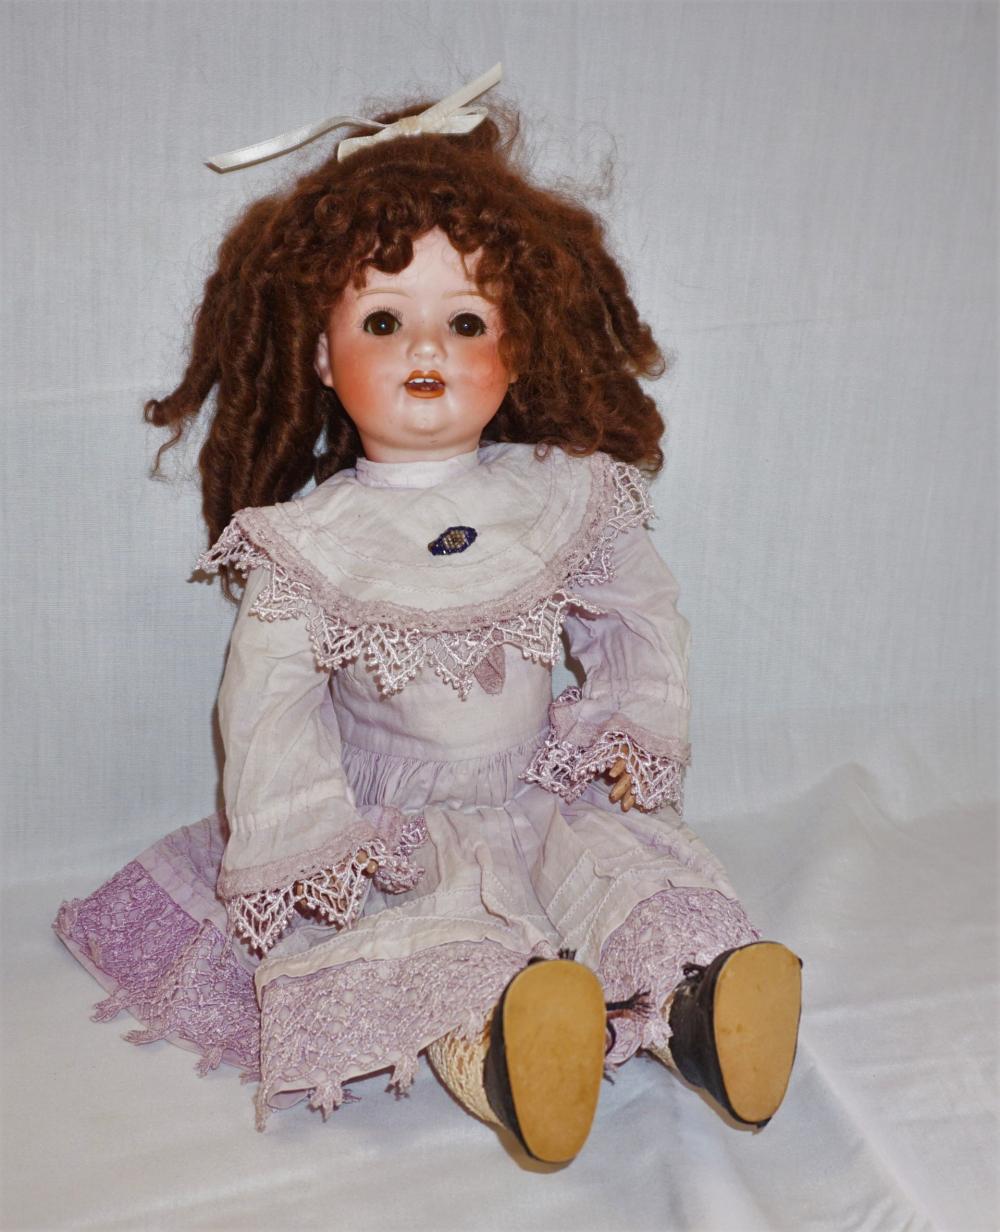 Heubach-Koppelsdorf doll